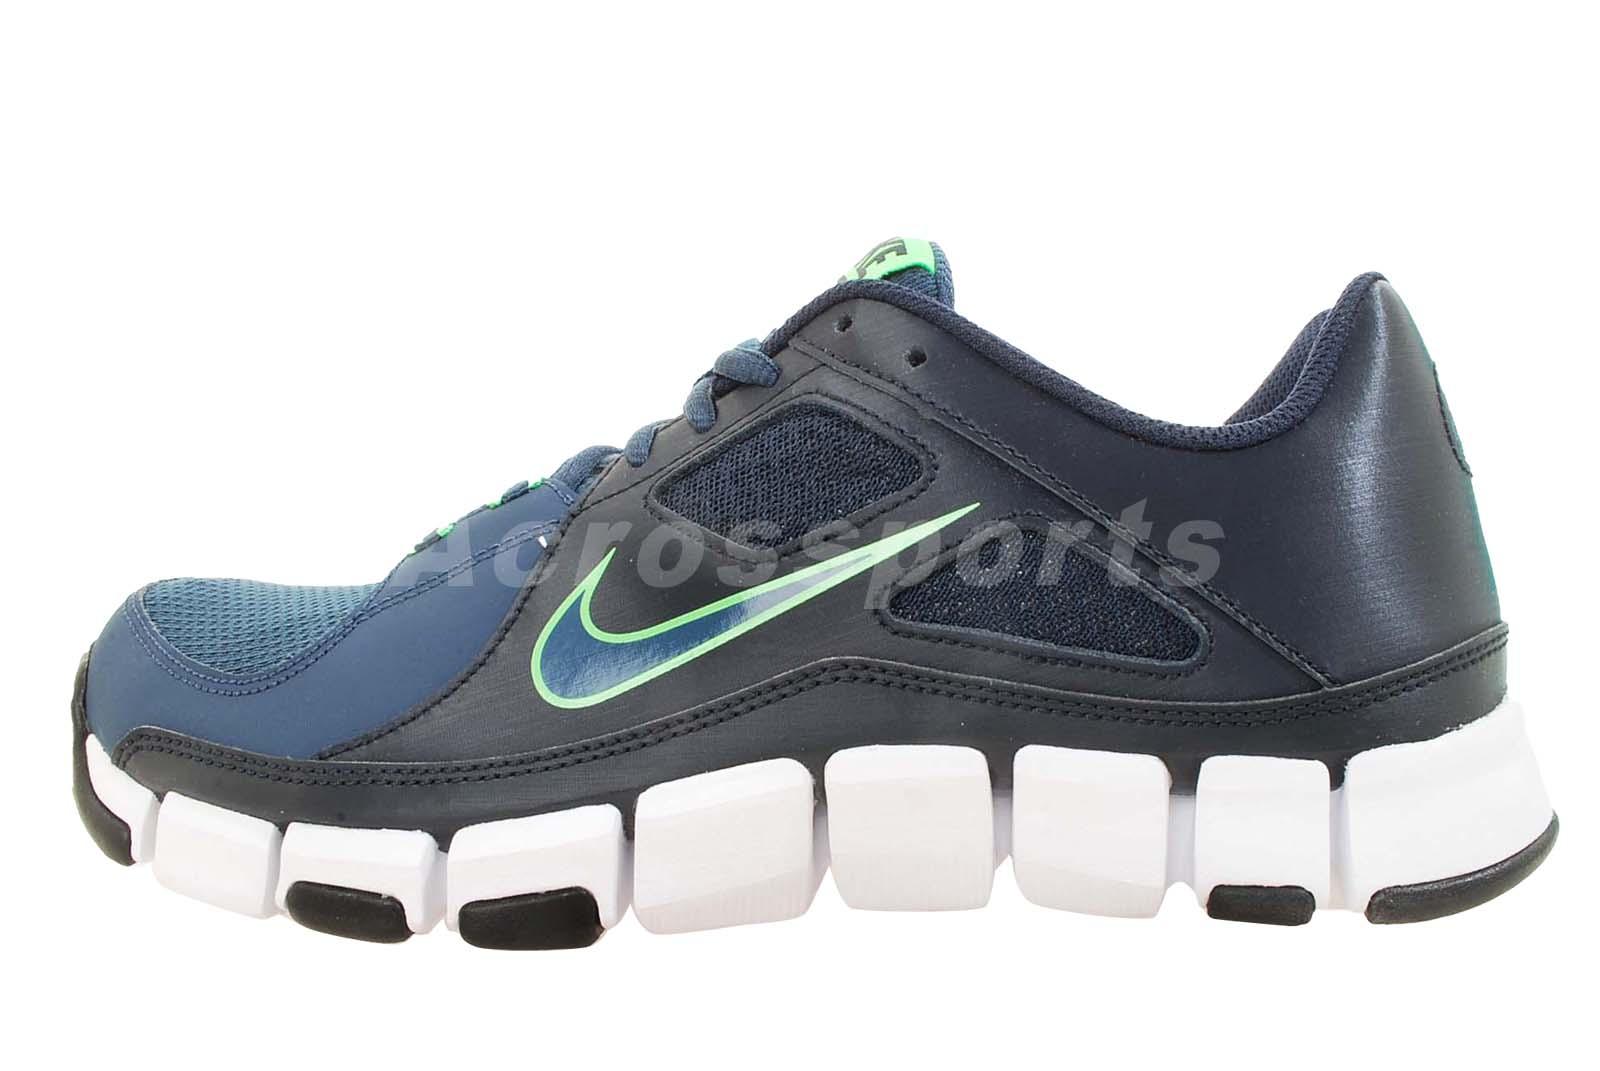 25650759075aa4 Best Nike Shox For Running Are Nike Shox Gravity Good For Running ...